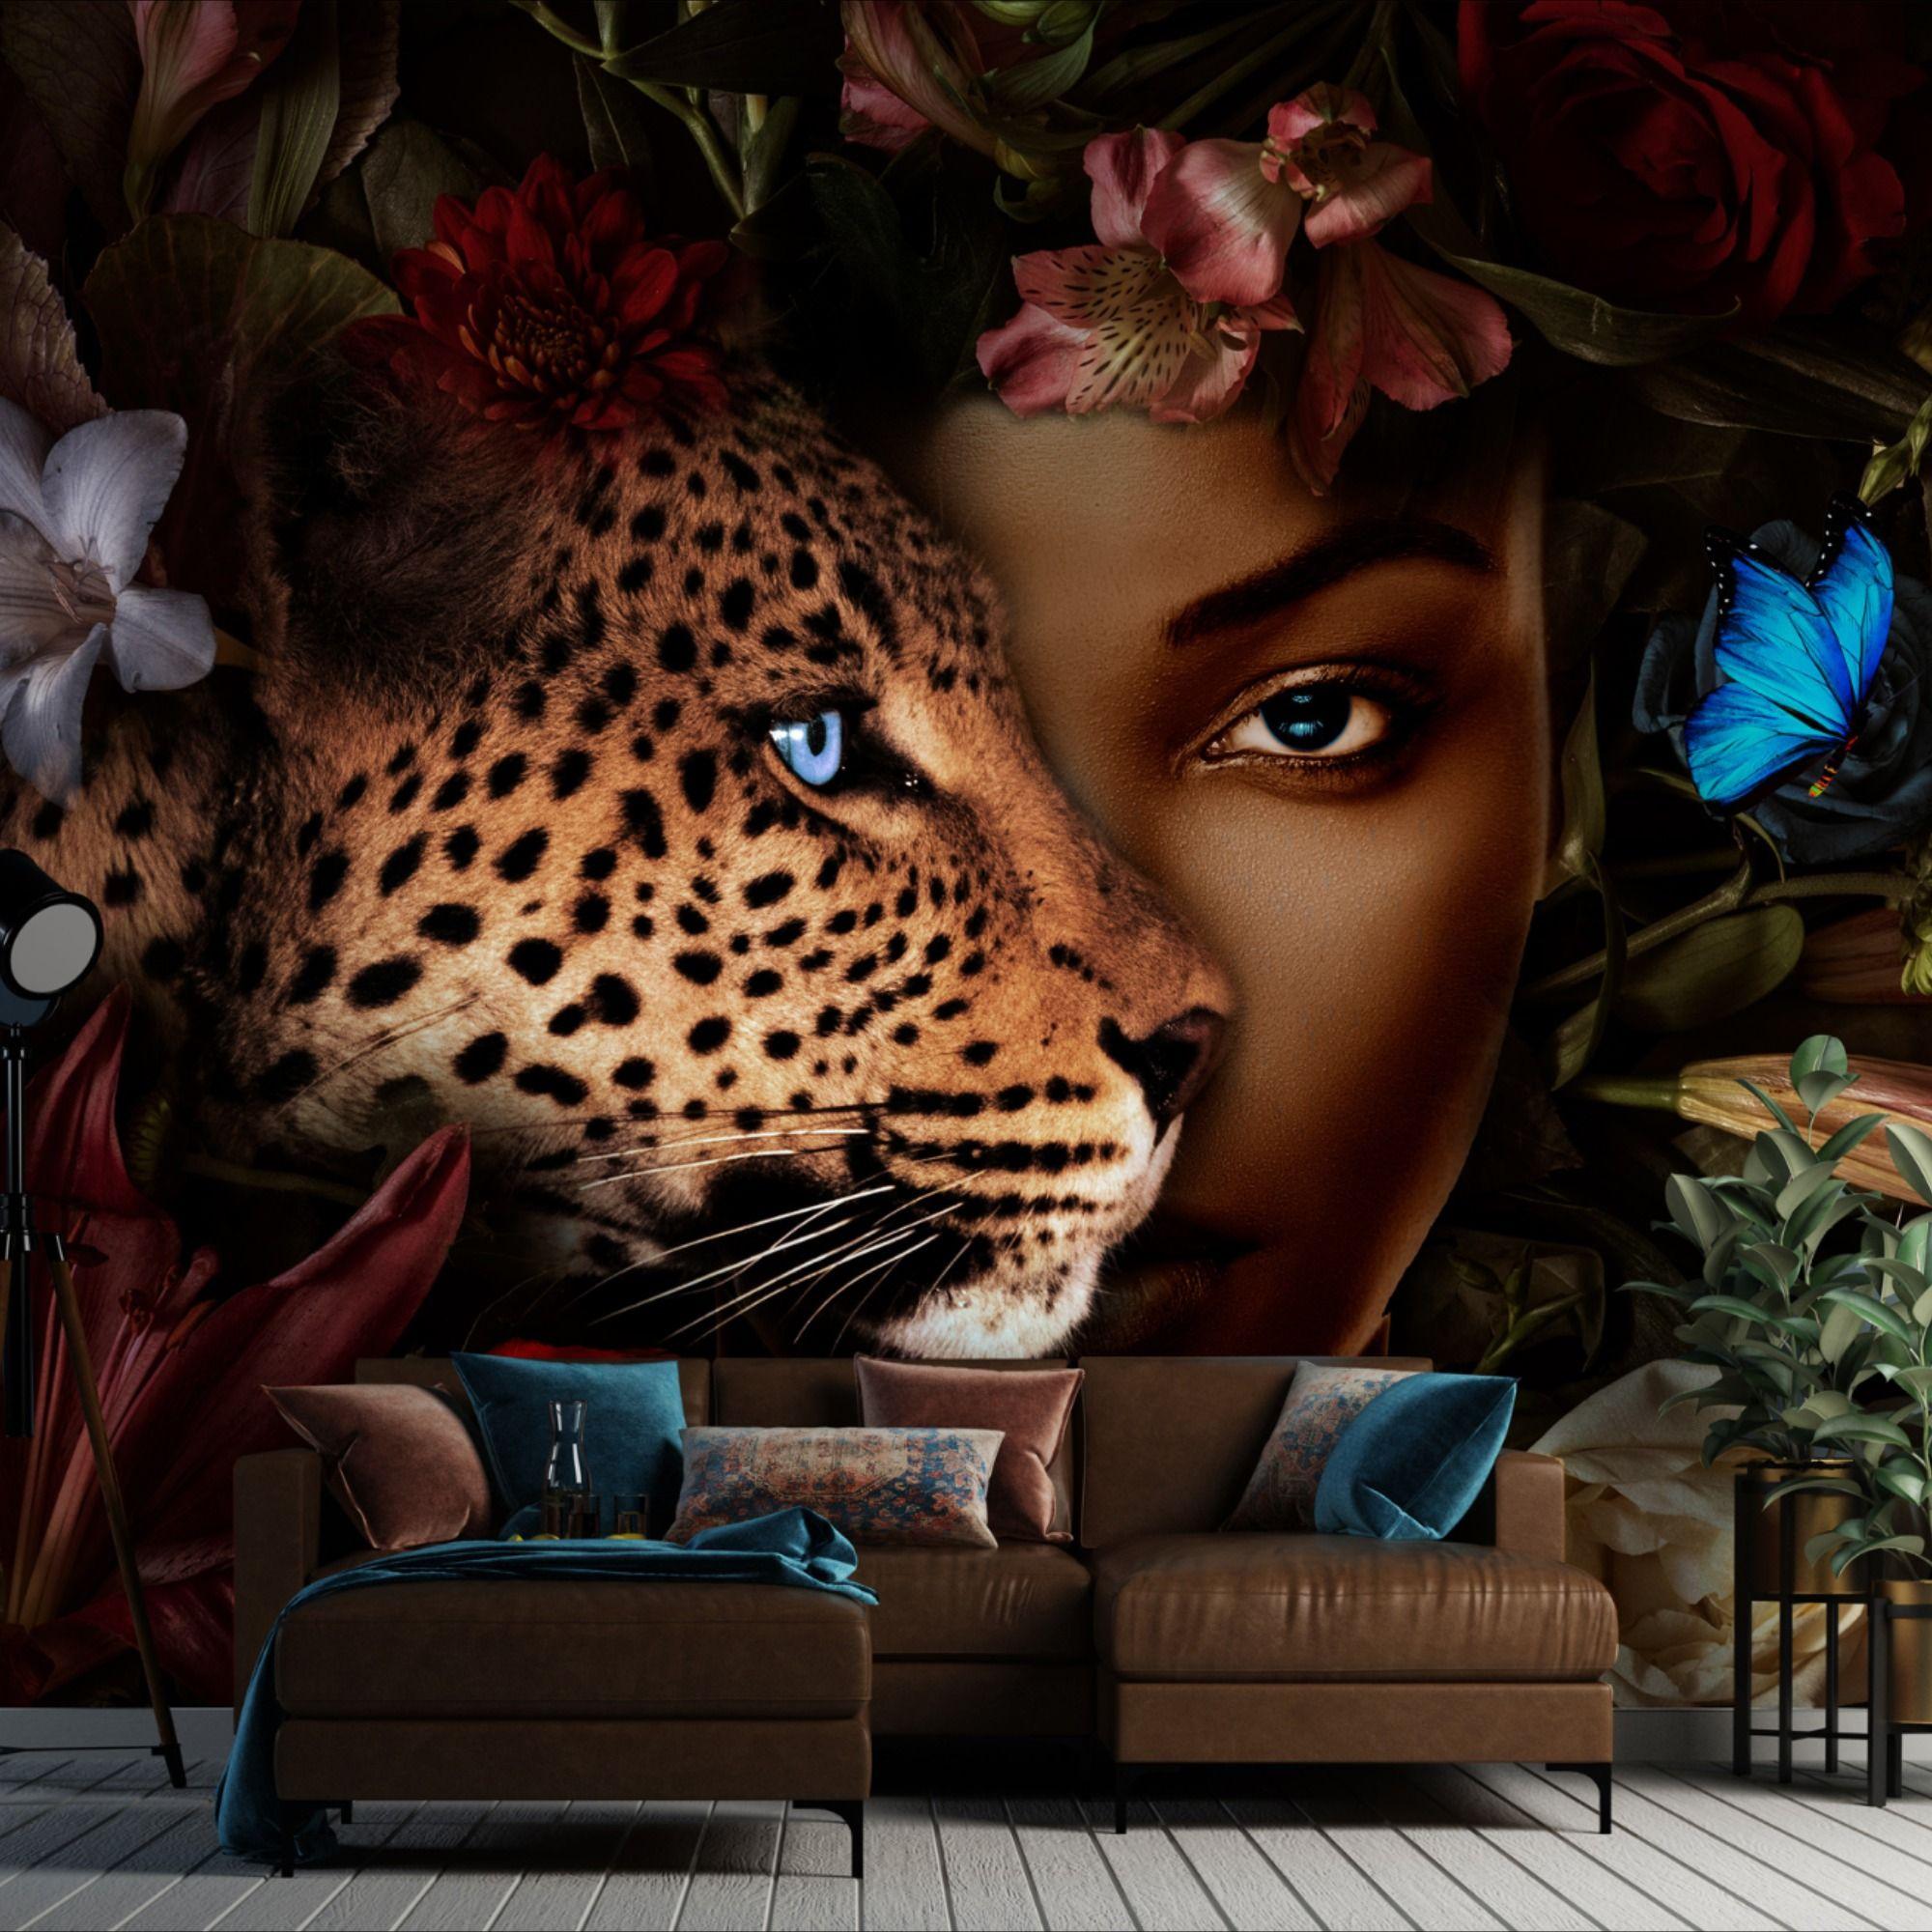 Dark Wallpaper Floral Wallpaper Leopard Wall Mural Black Etsy Floral Wallpaper Dark Wallpaper Wallpaper